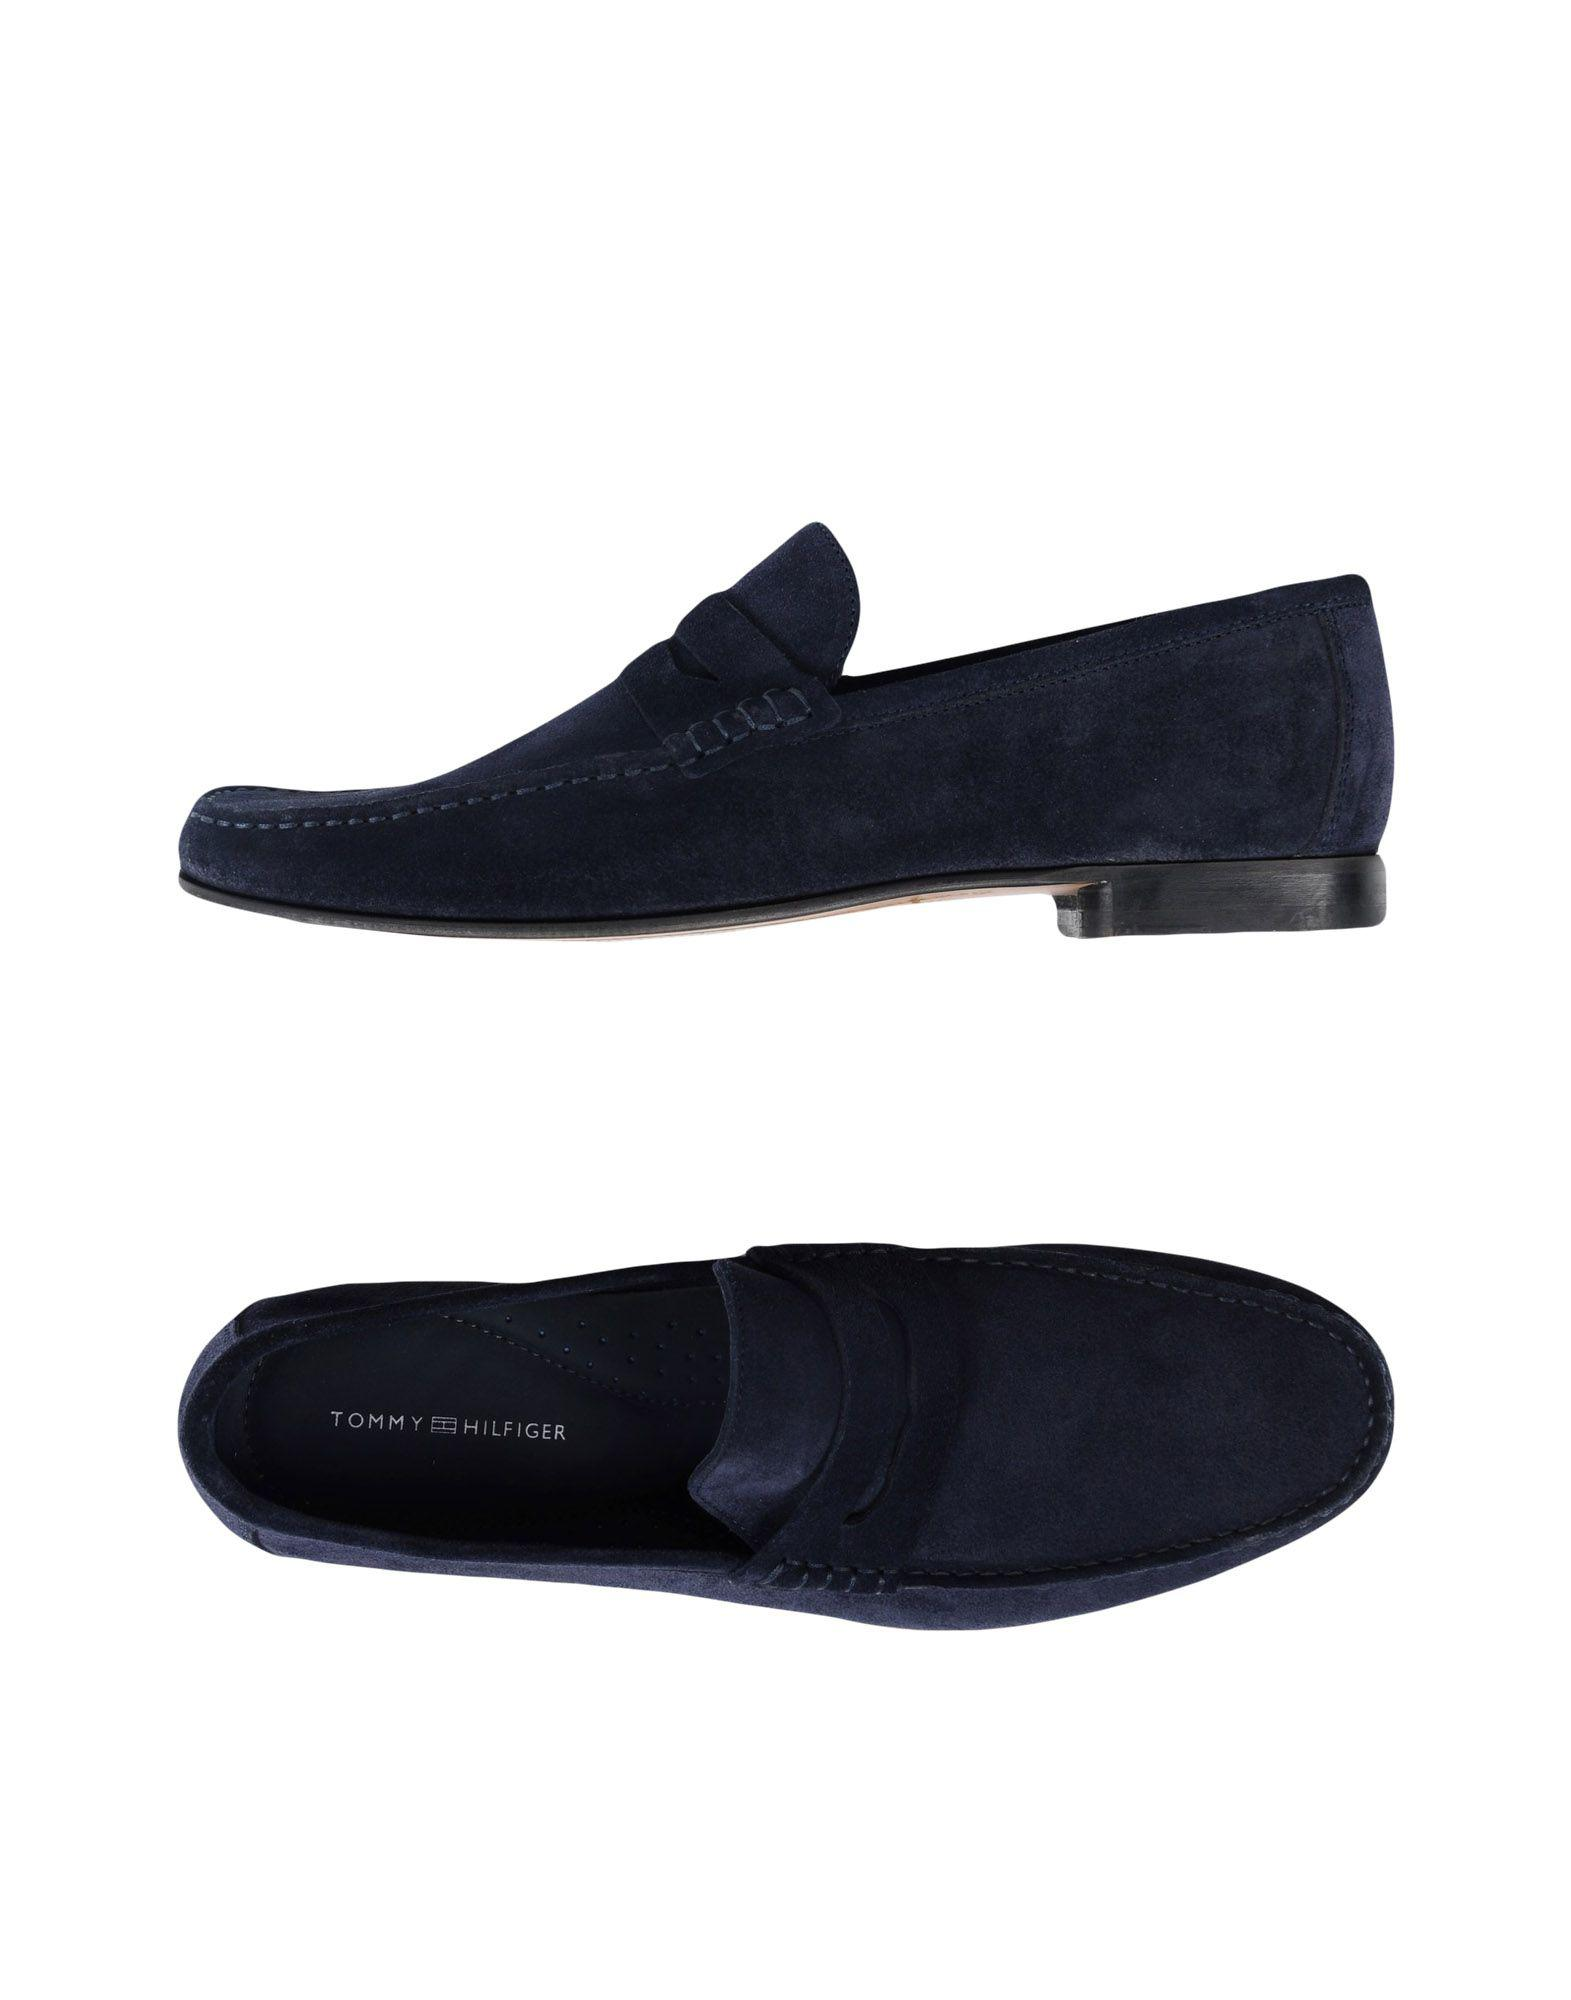 f12b782b255f2 Lyst - Tommy Hilfiger Loafer in Blue for Men